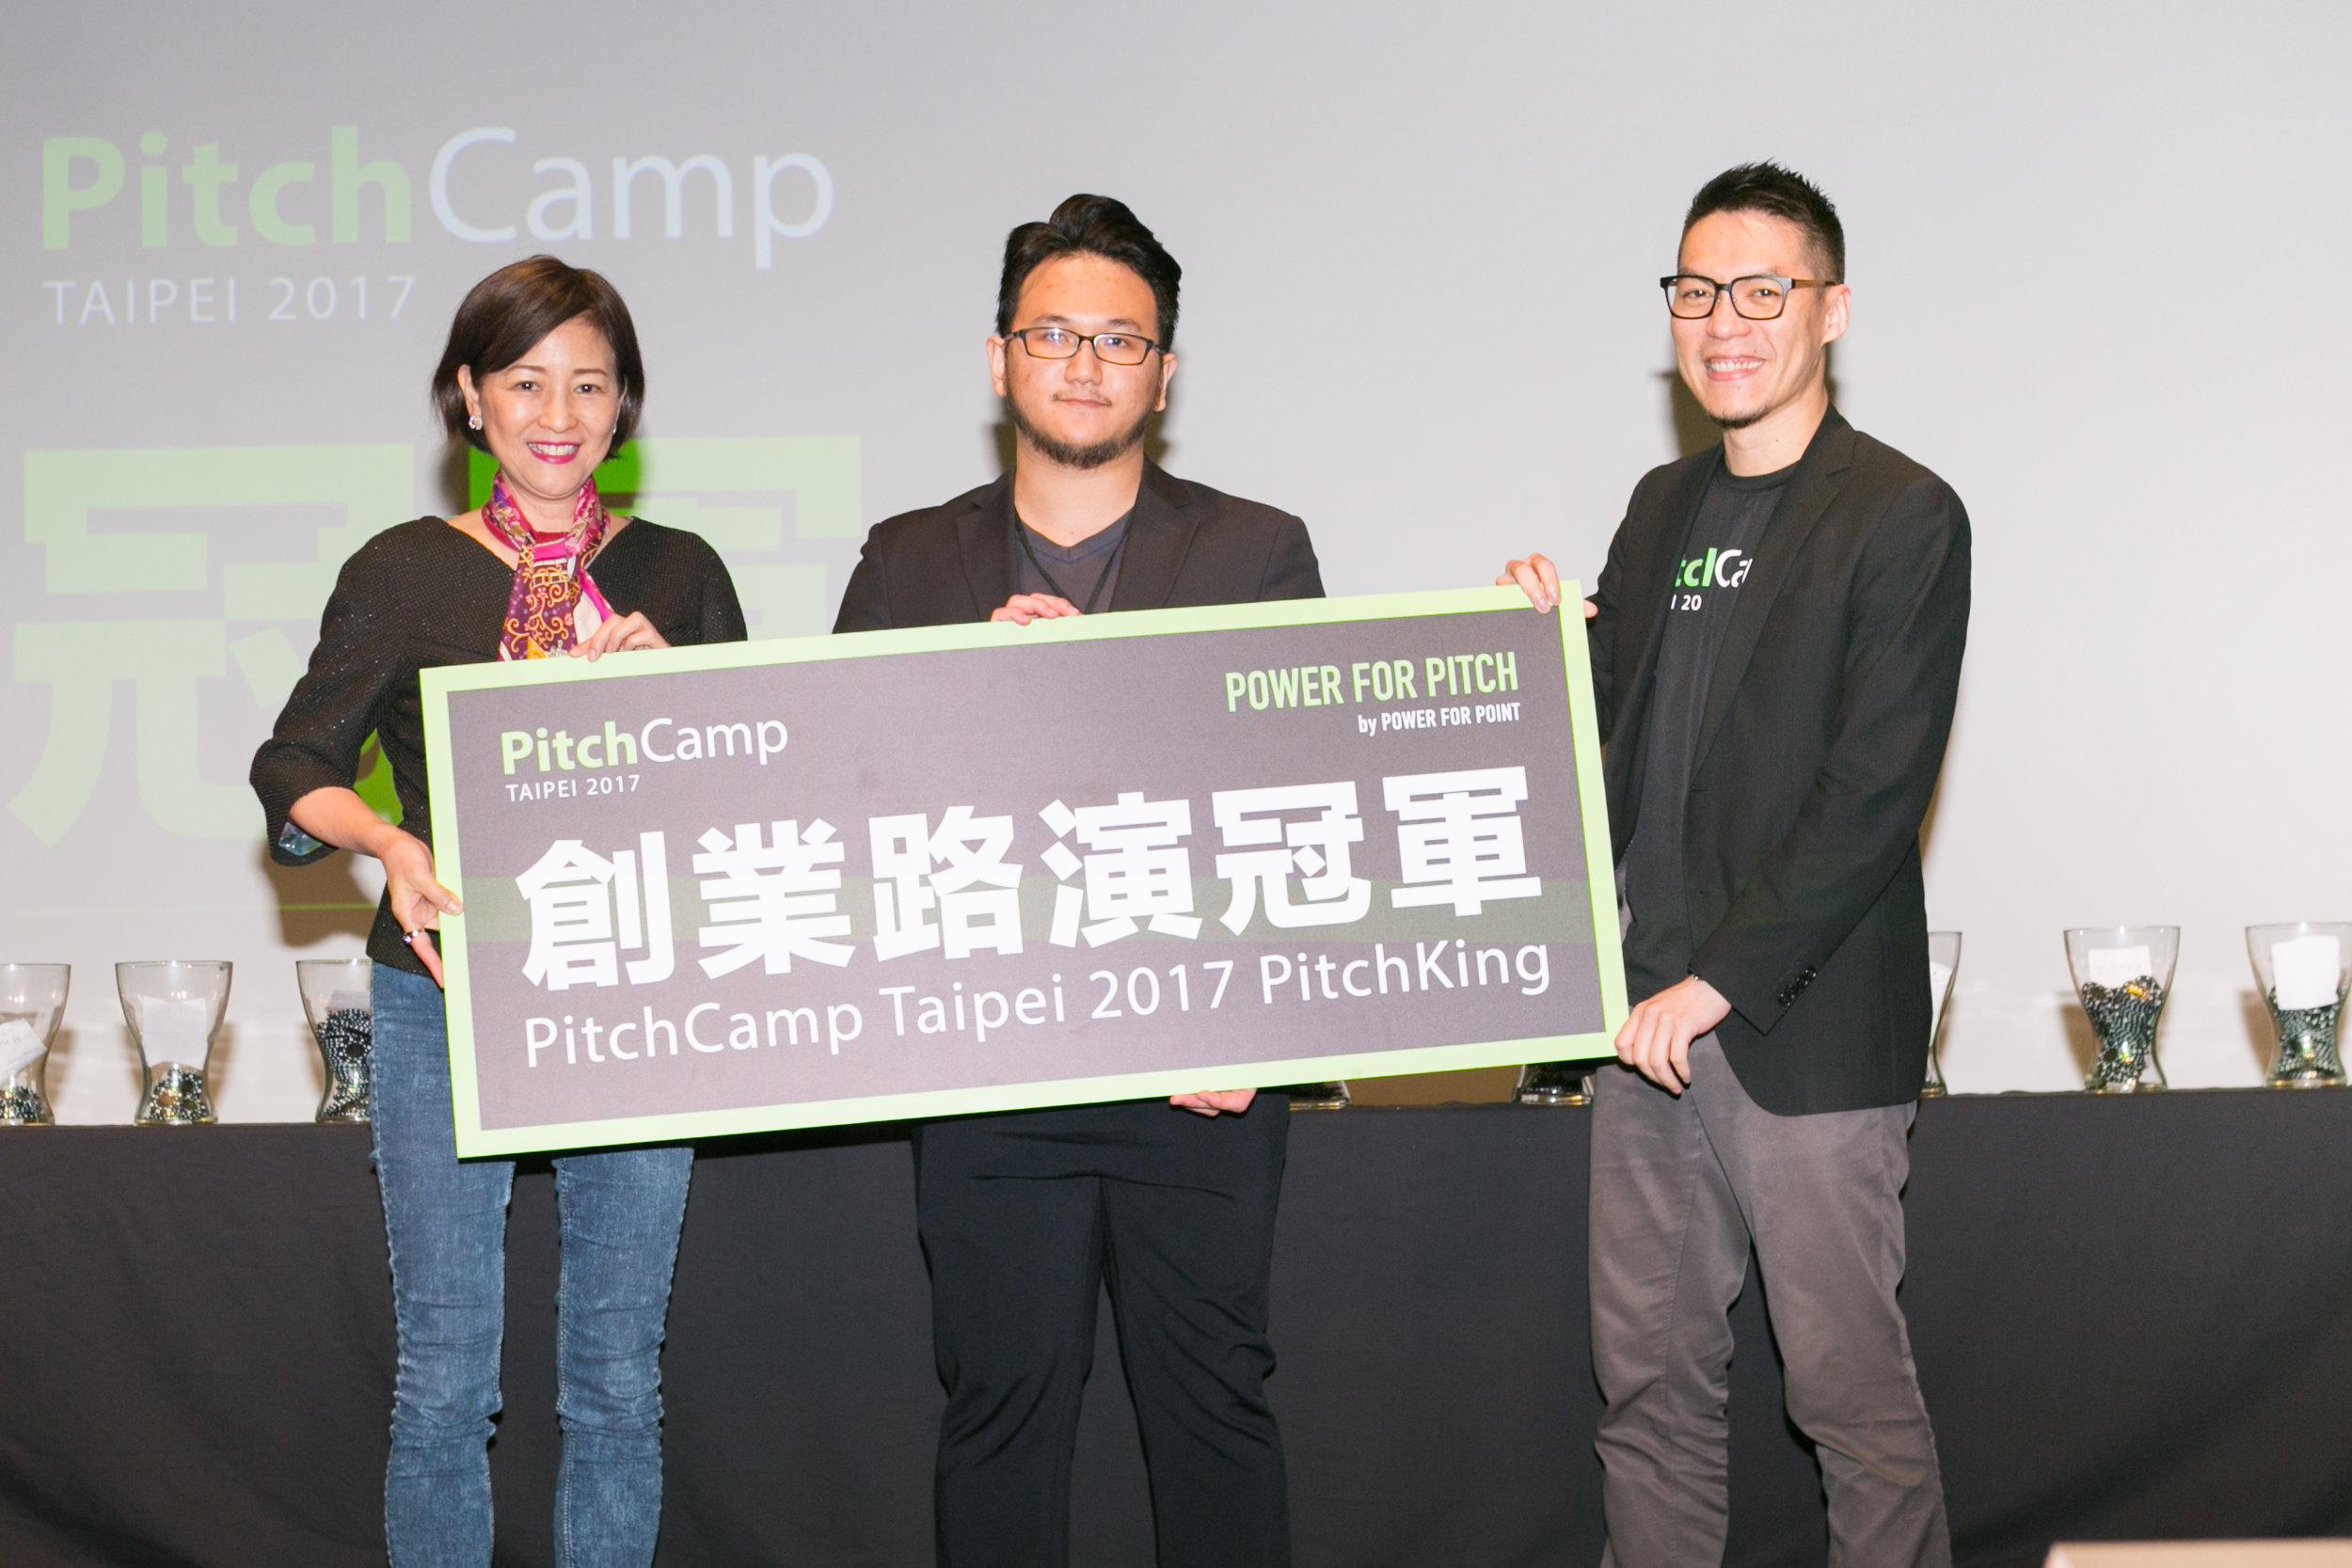 PitchCamp 2017